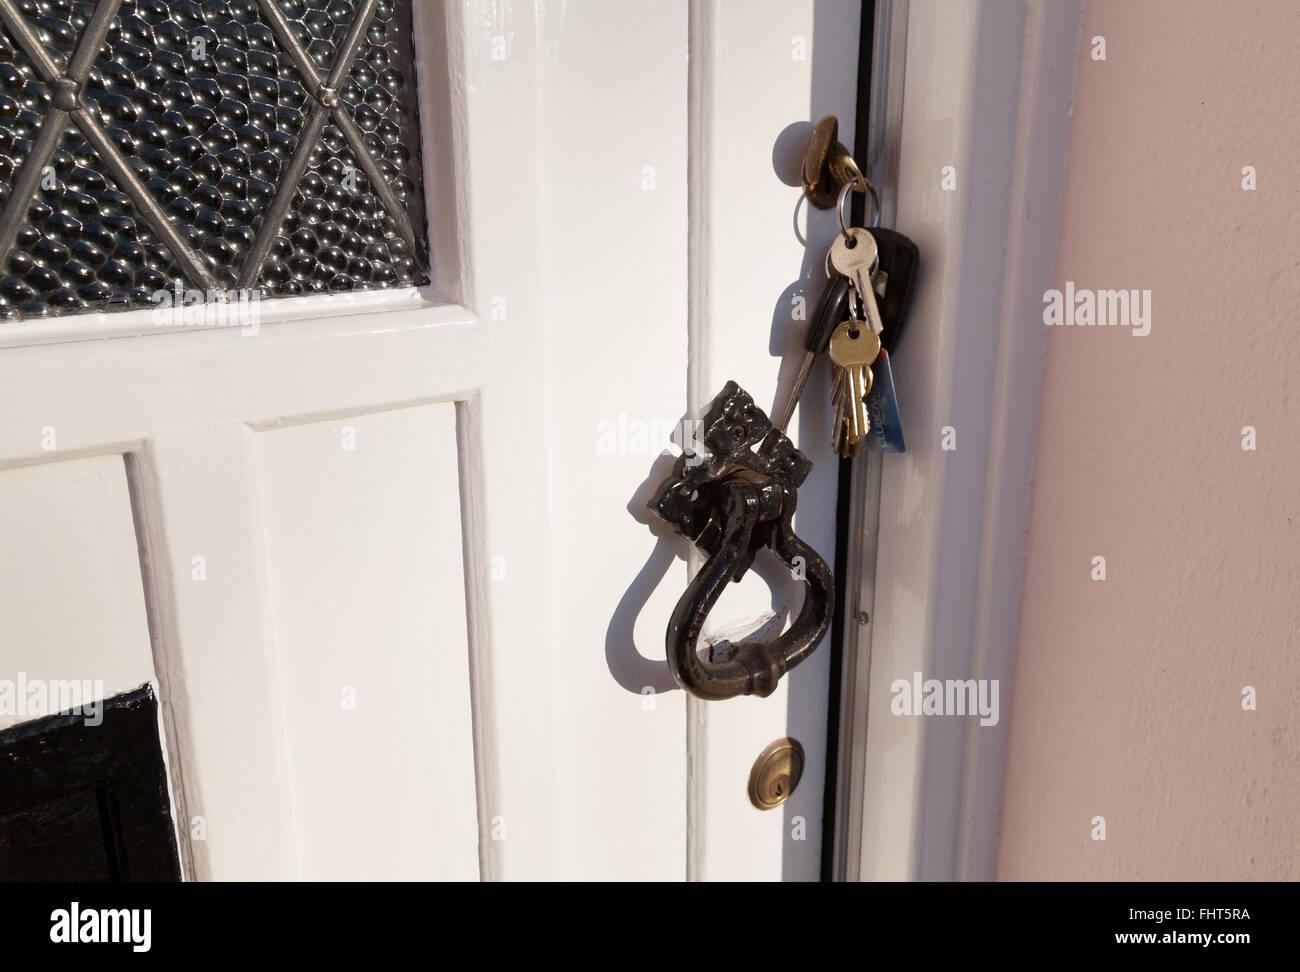 A house door with forgotten keys left in the lock, UK Stock Photo